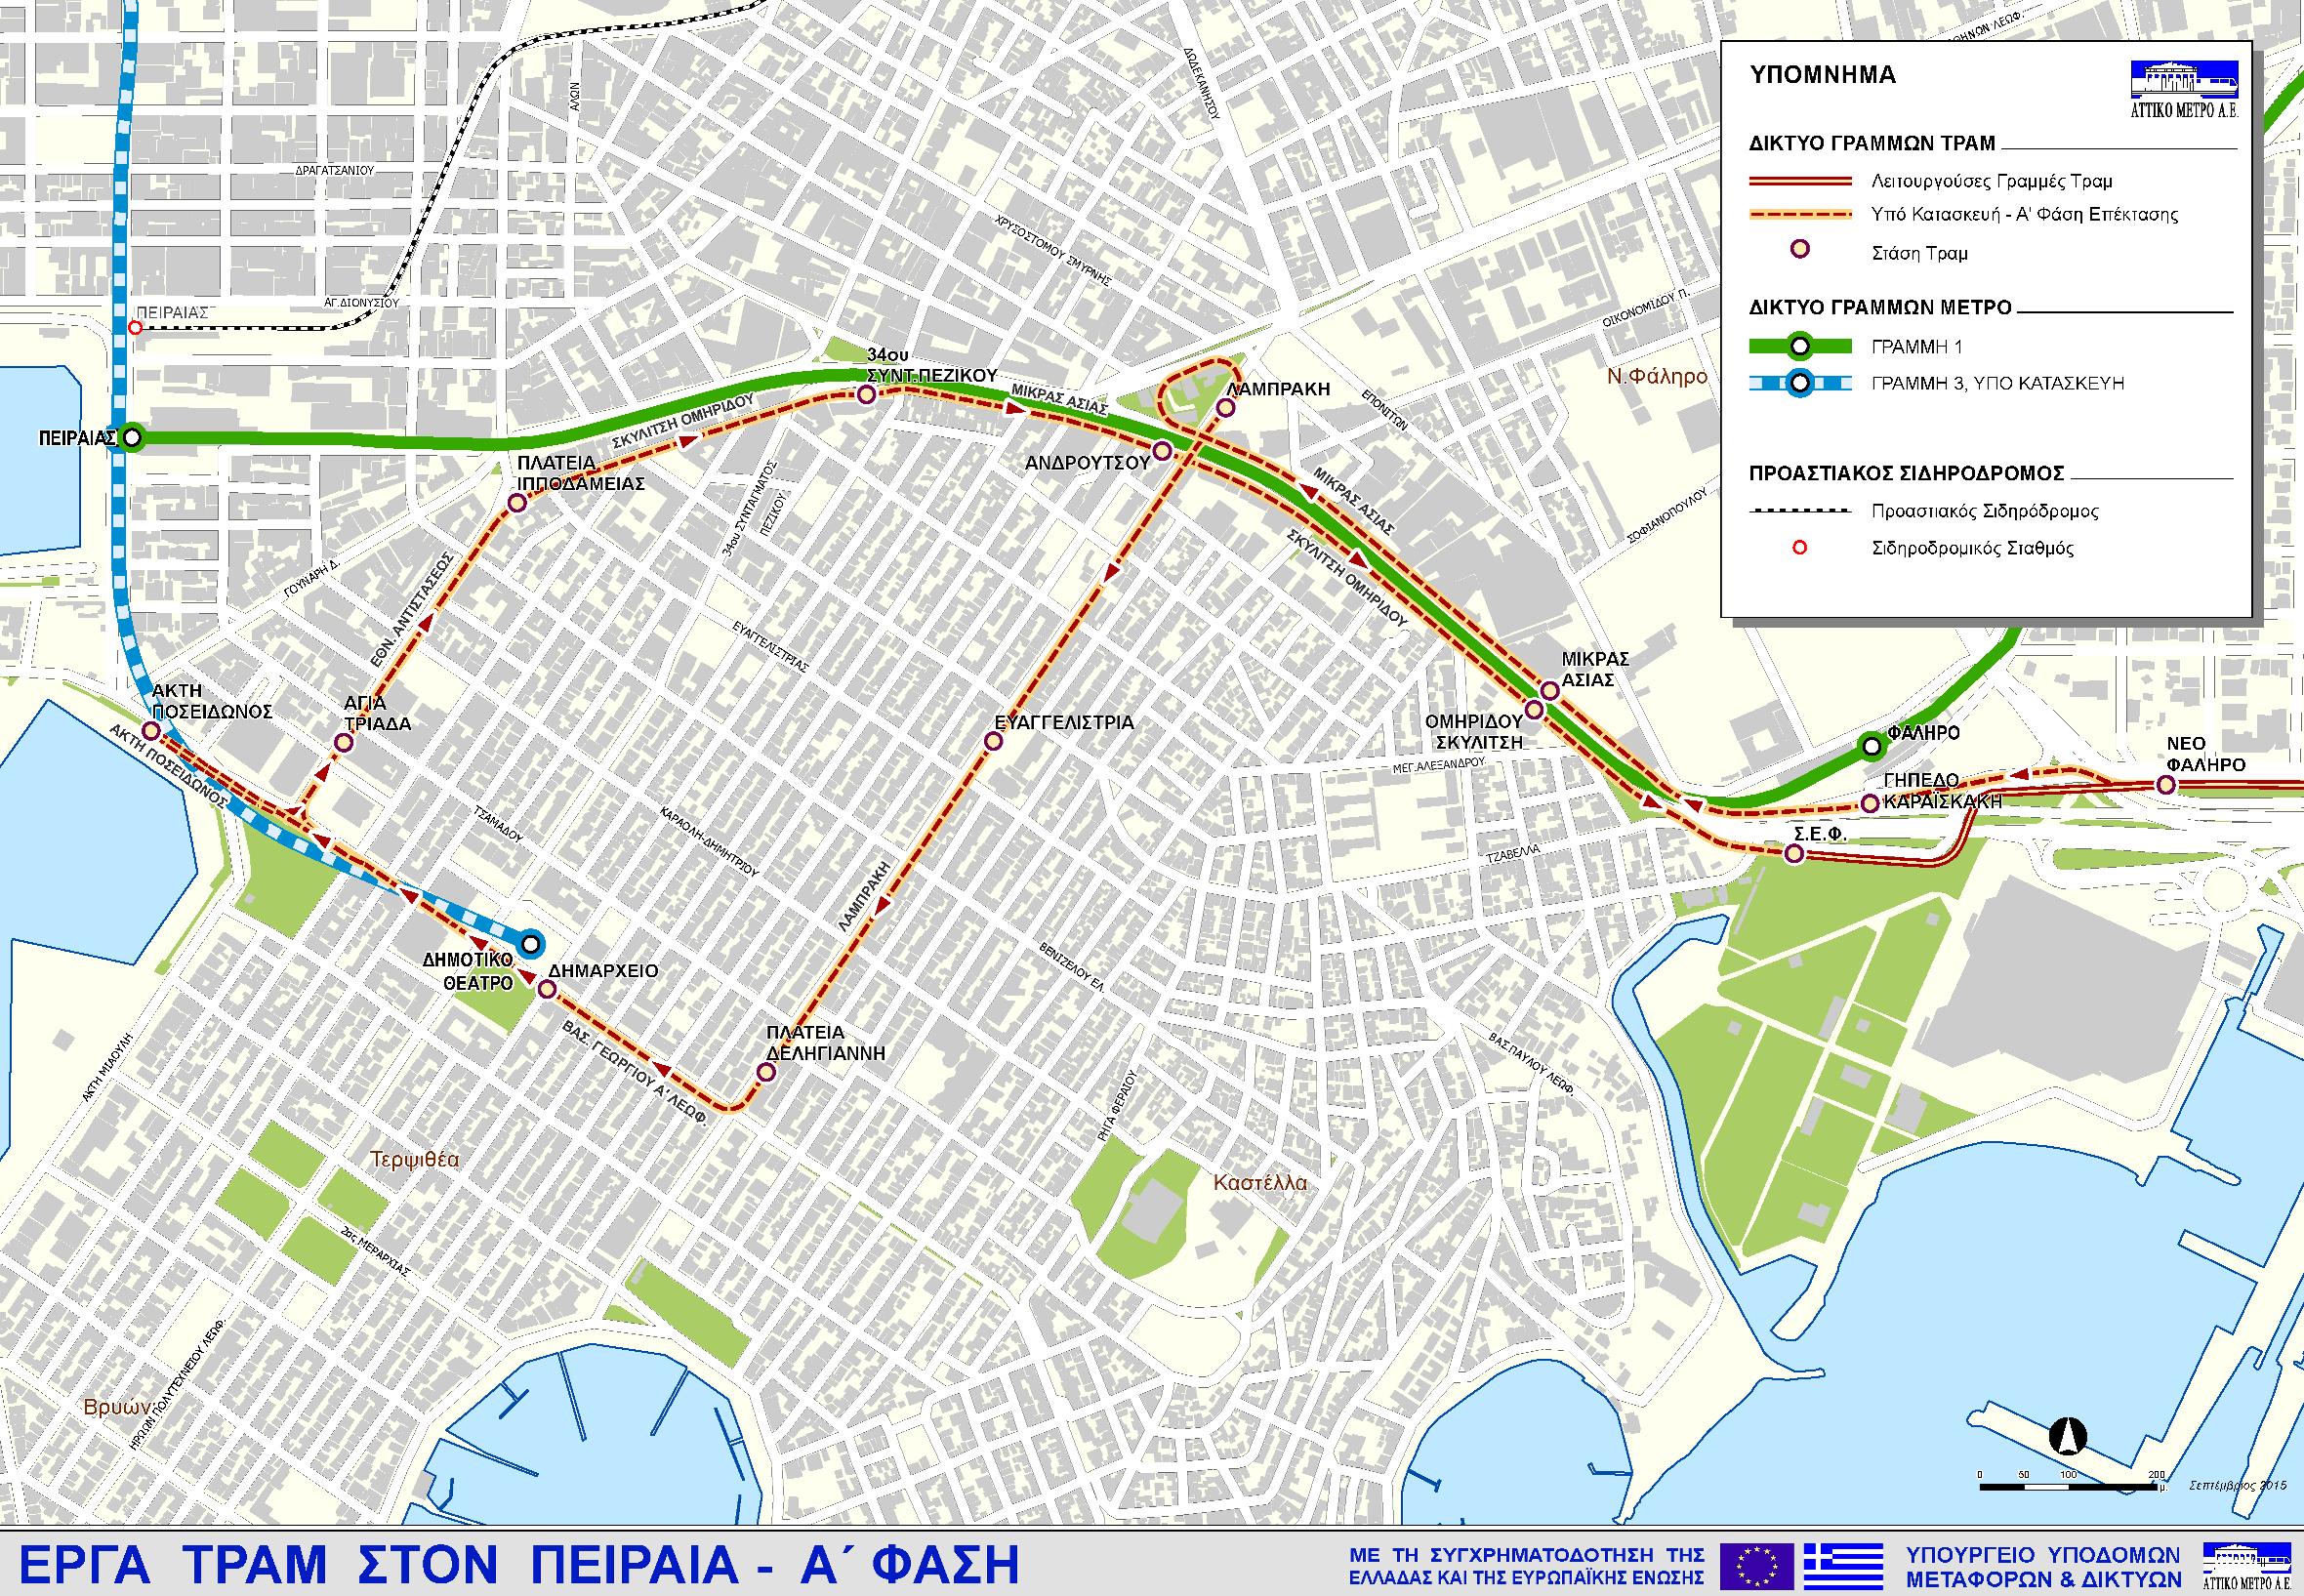 AM_TRAM_Piraeus_Map_Nov15_gr_LG